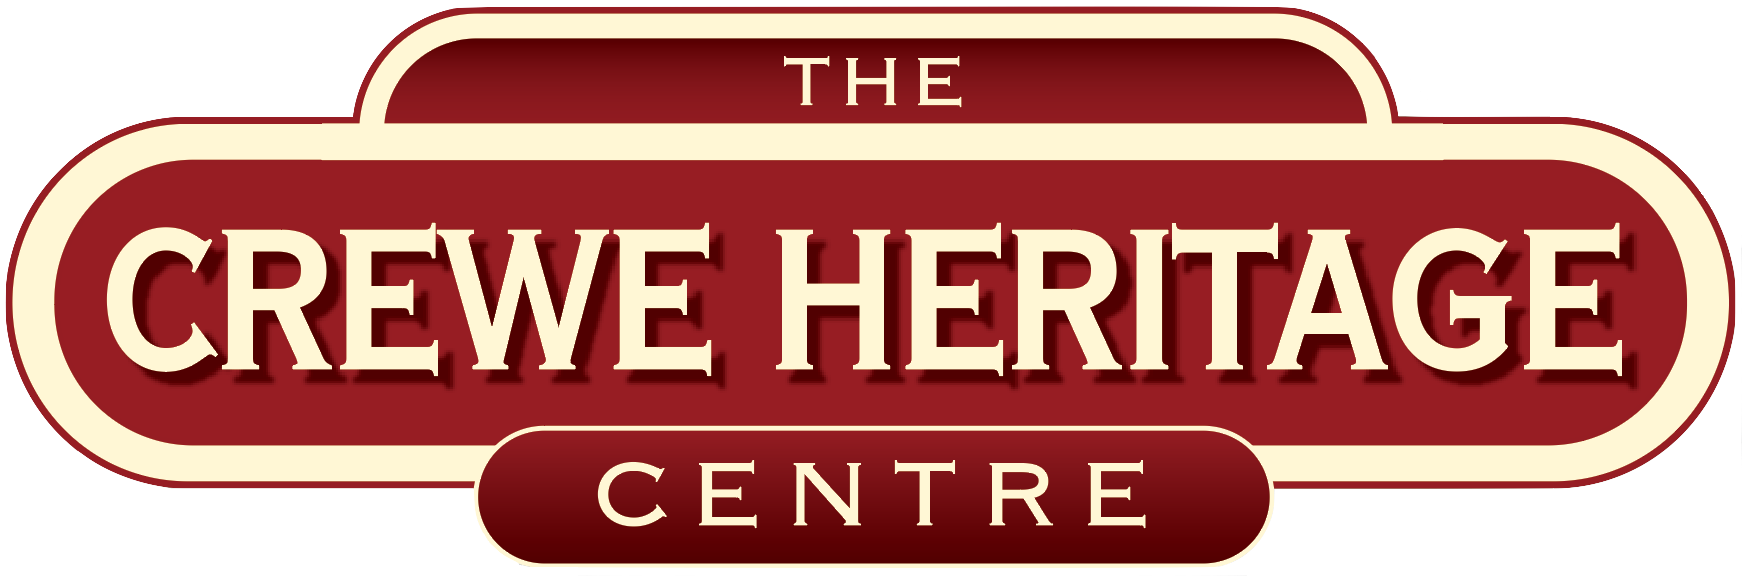 Crewe Heritage Centre - Wikipedia